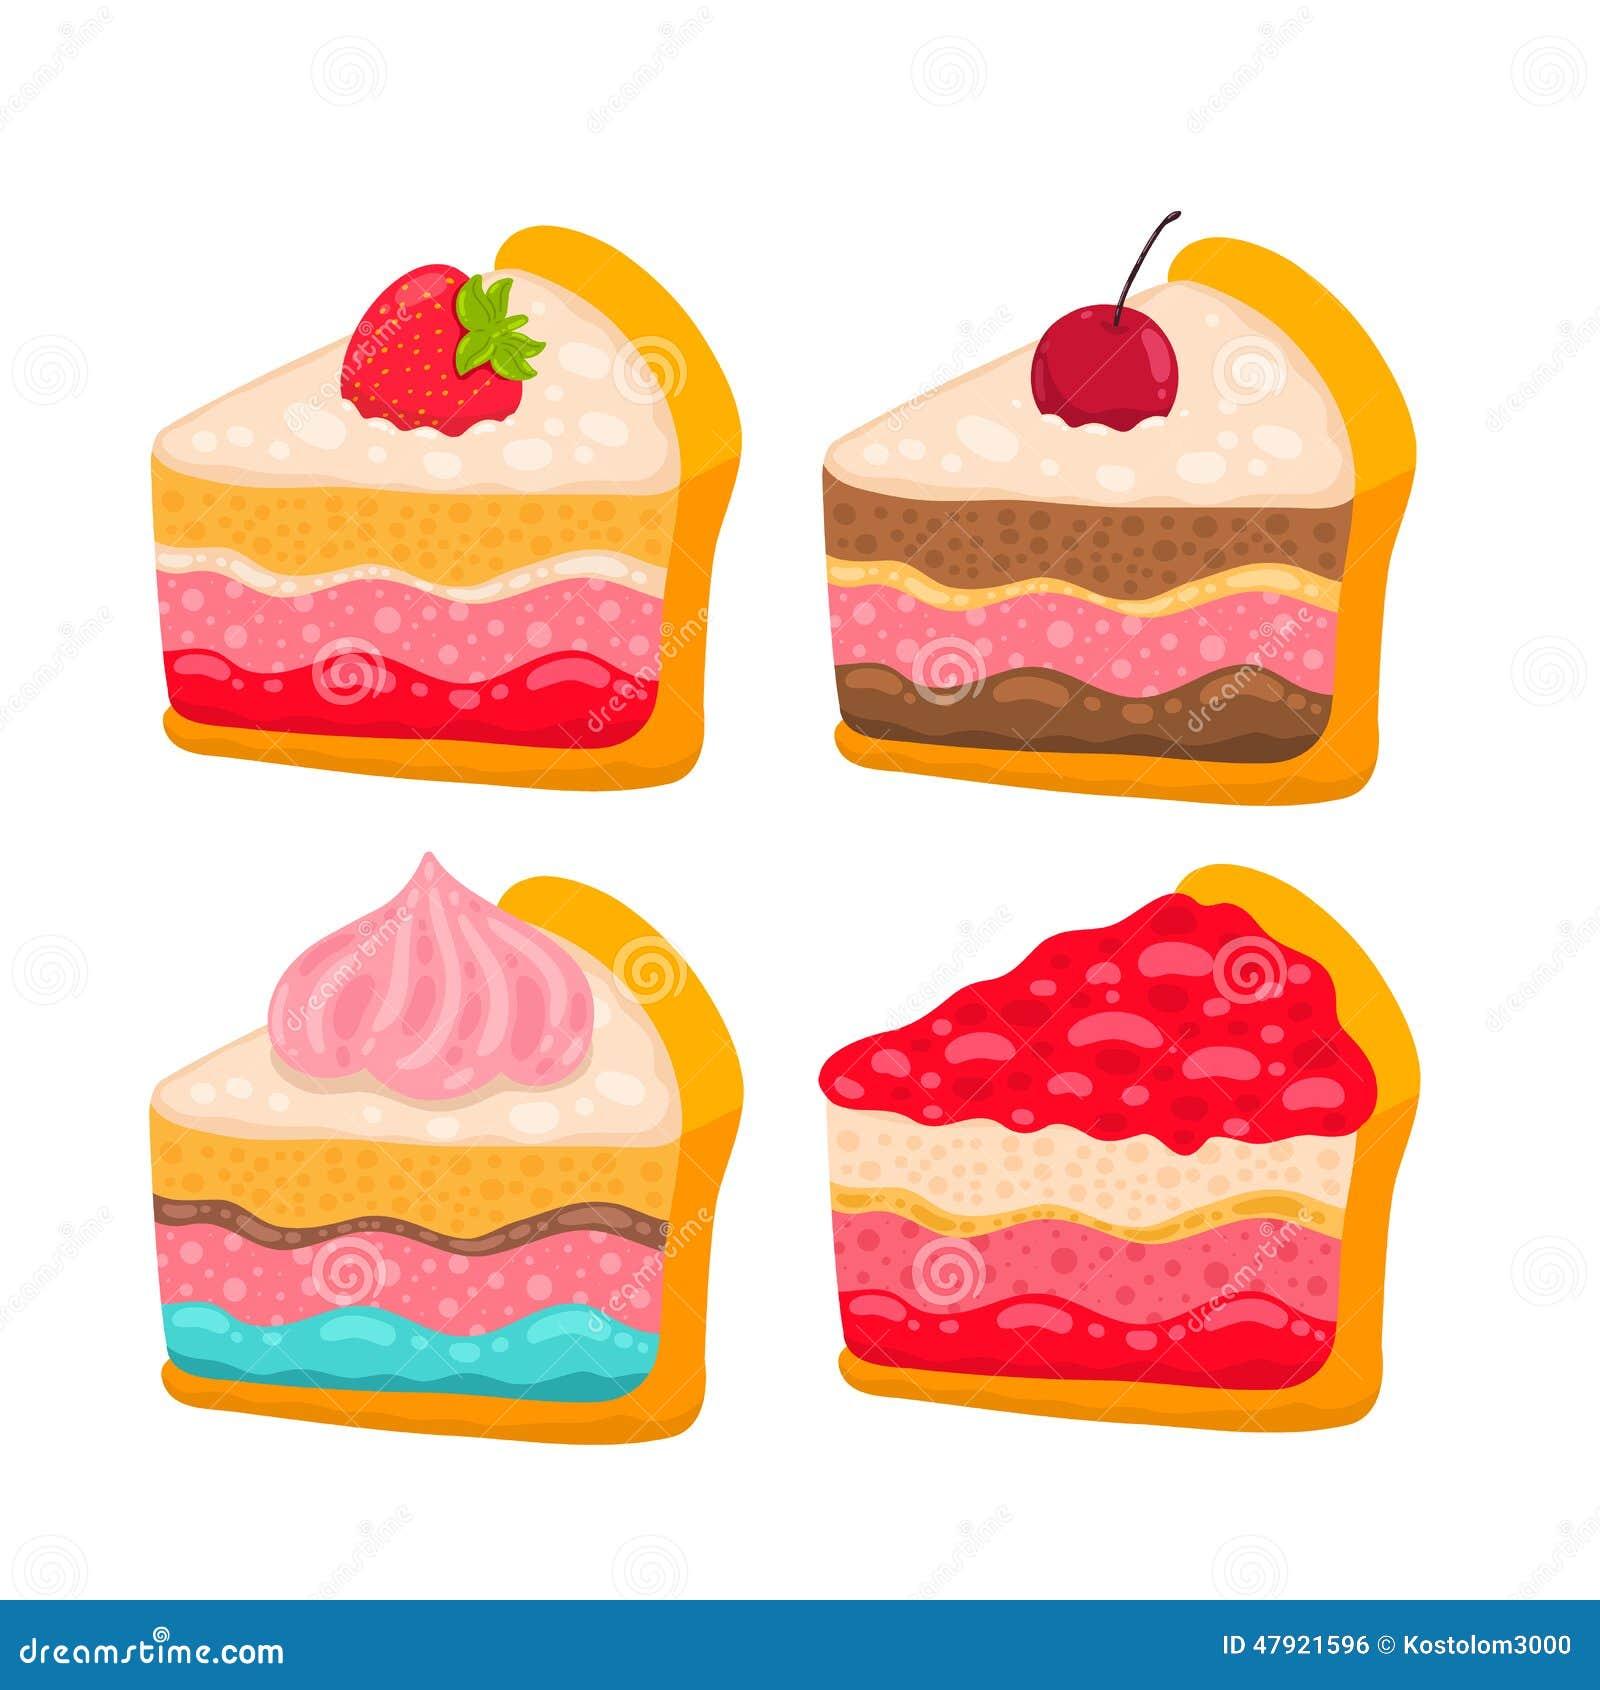 Birthday Cake Slice Cartoon